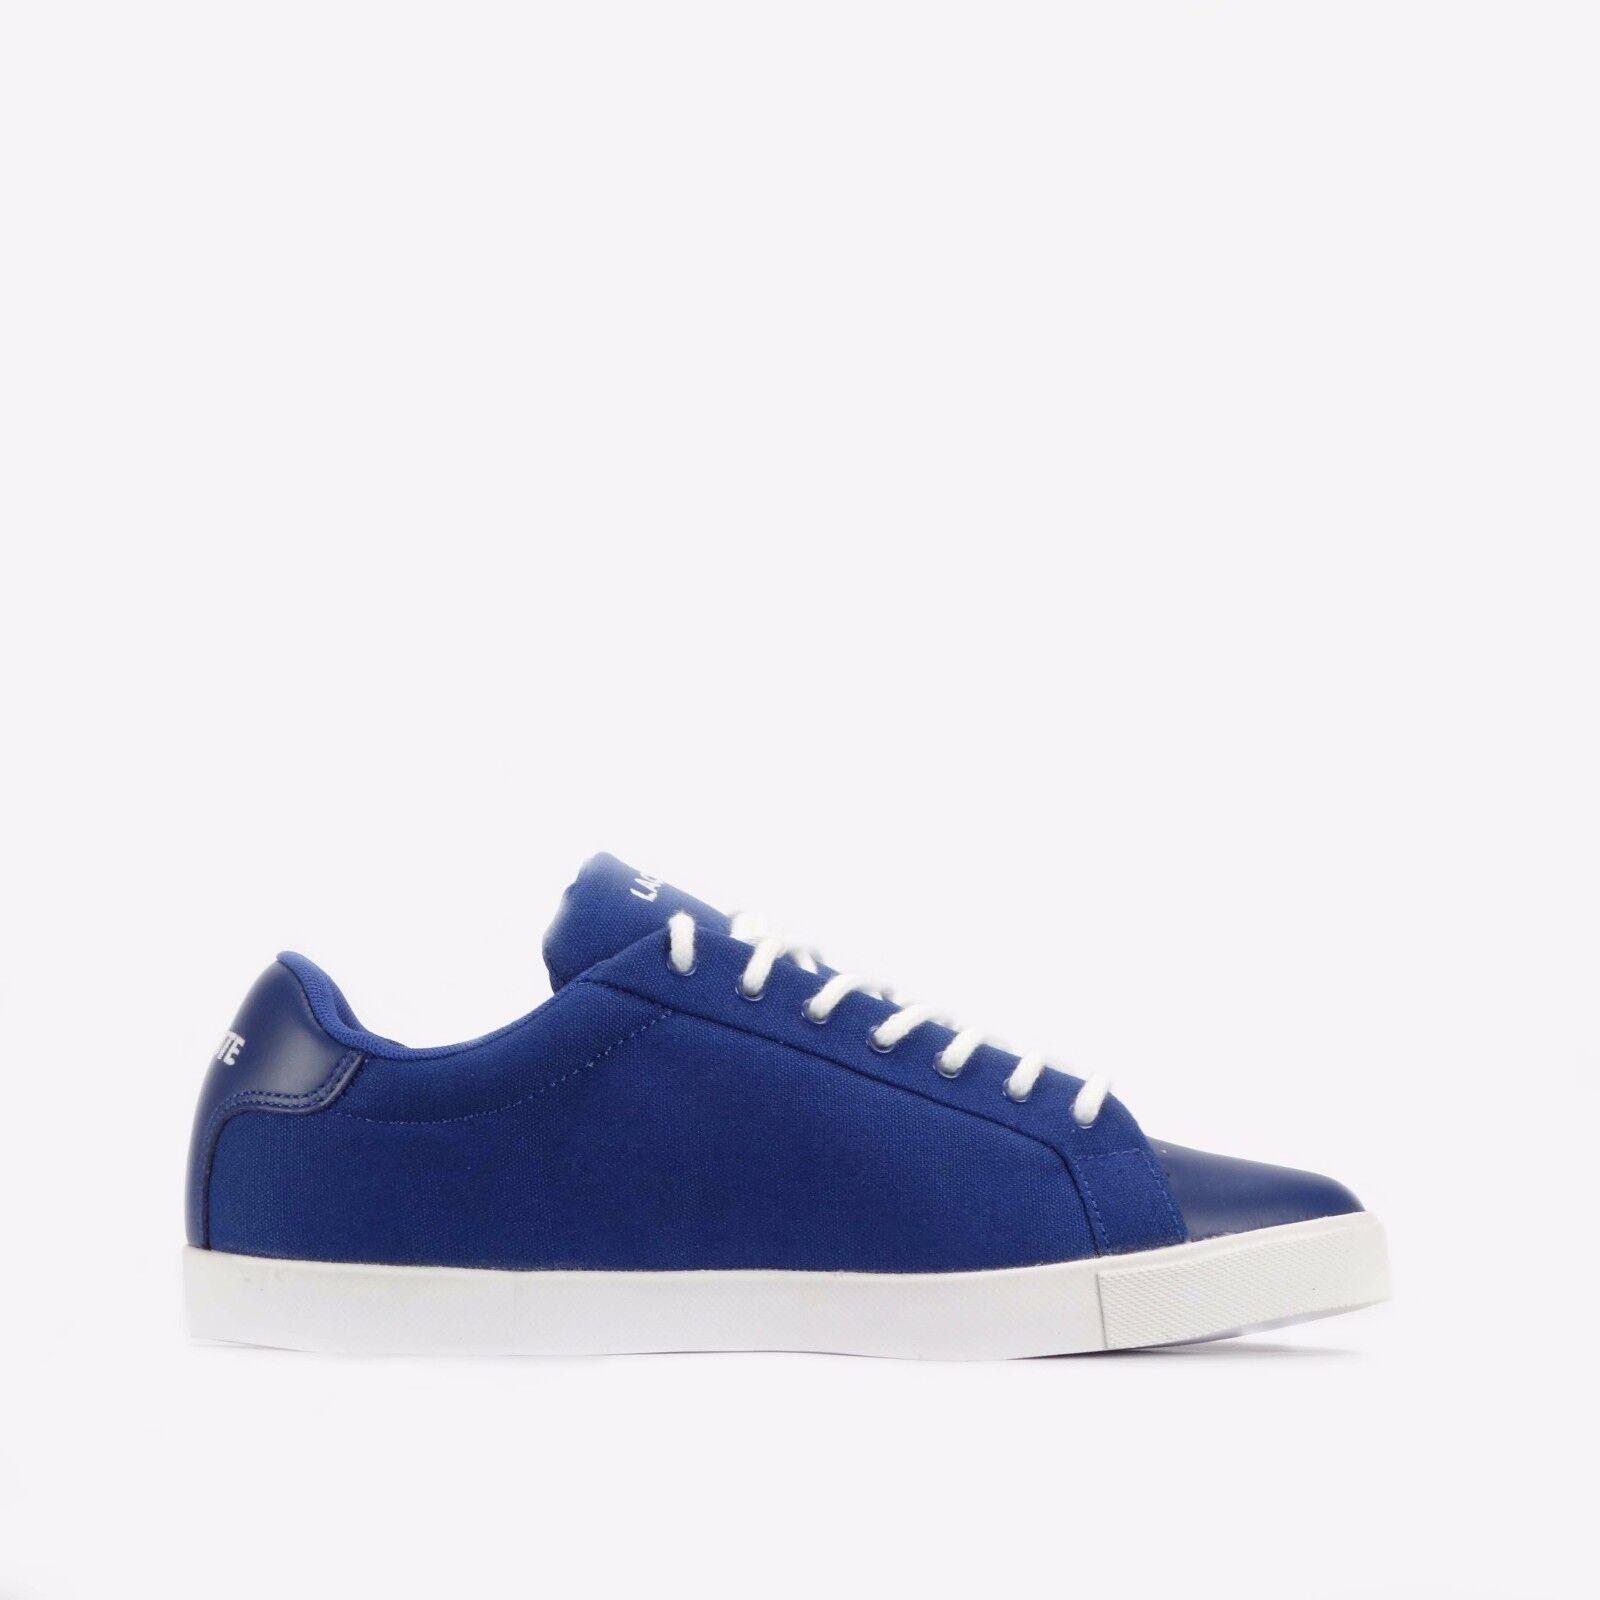 Lacoste  Graduate Pique  Lacoste Uomo Schuhes in Blau/WEISS 386f8d